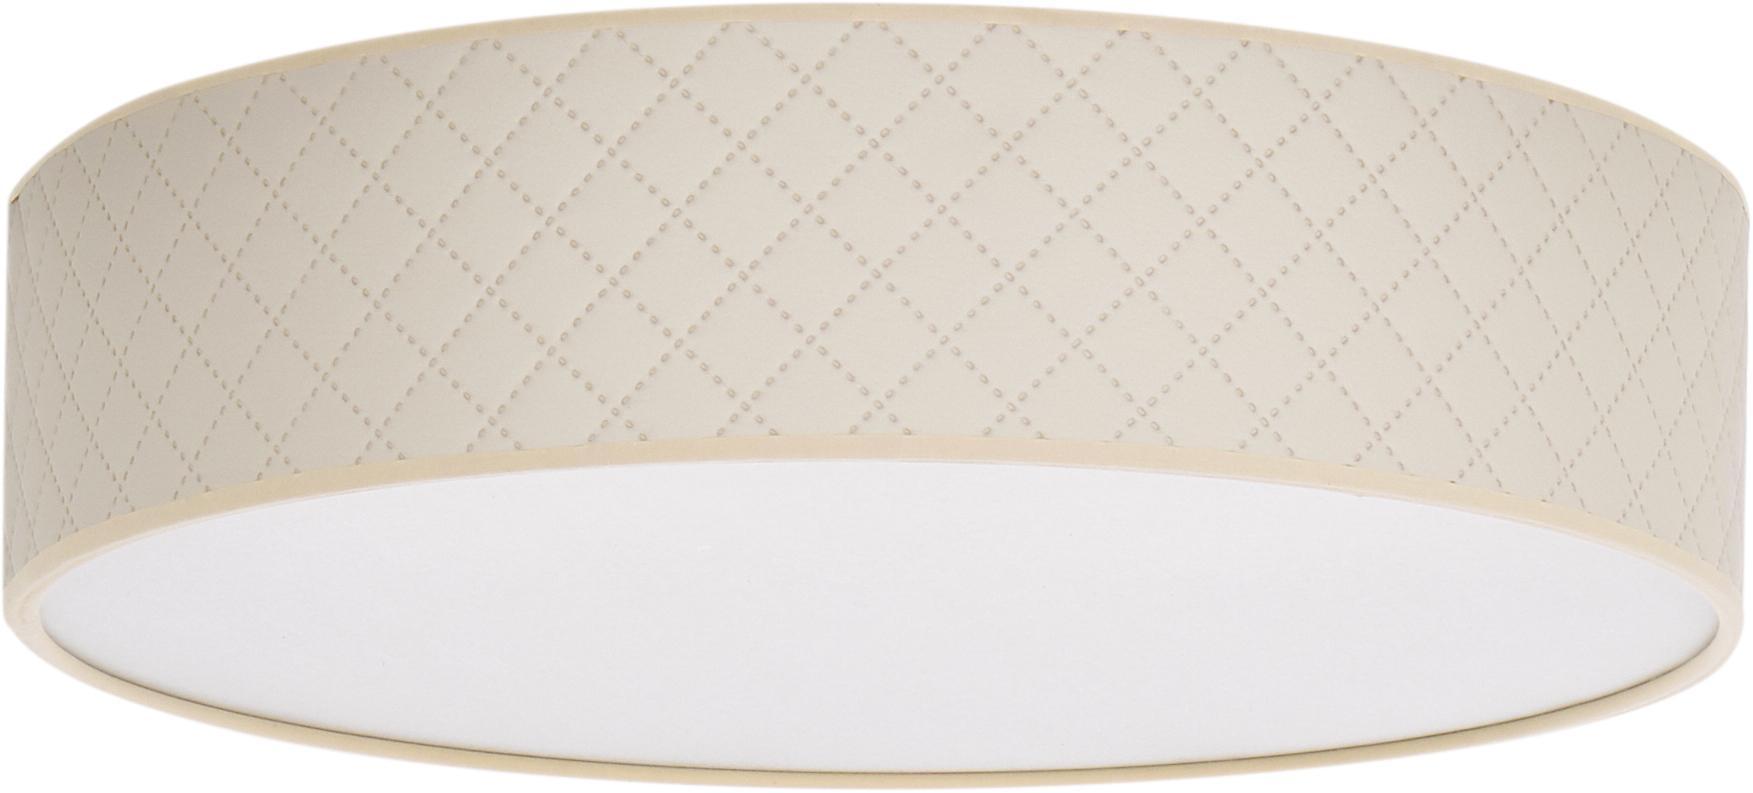 Deckenleuchte Trece aus Leder, Lampenschirm: Leder, Creme, Ø 40 x H 11 cm